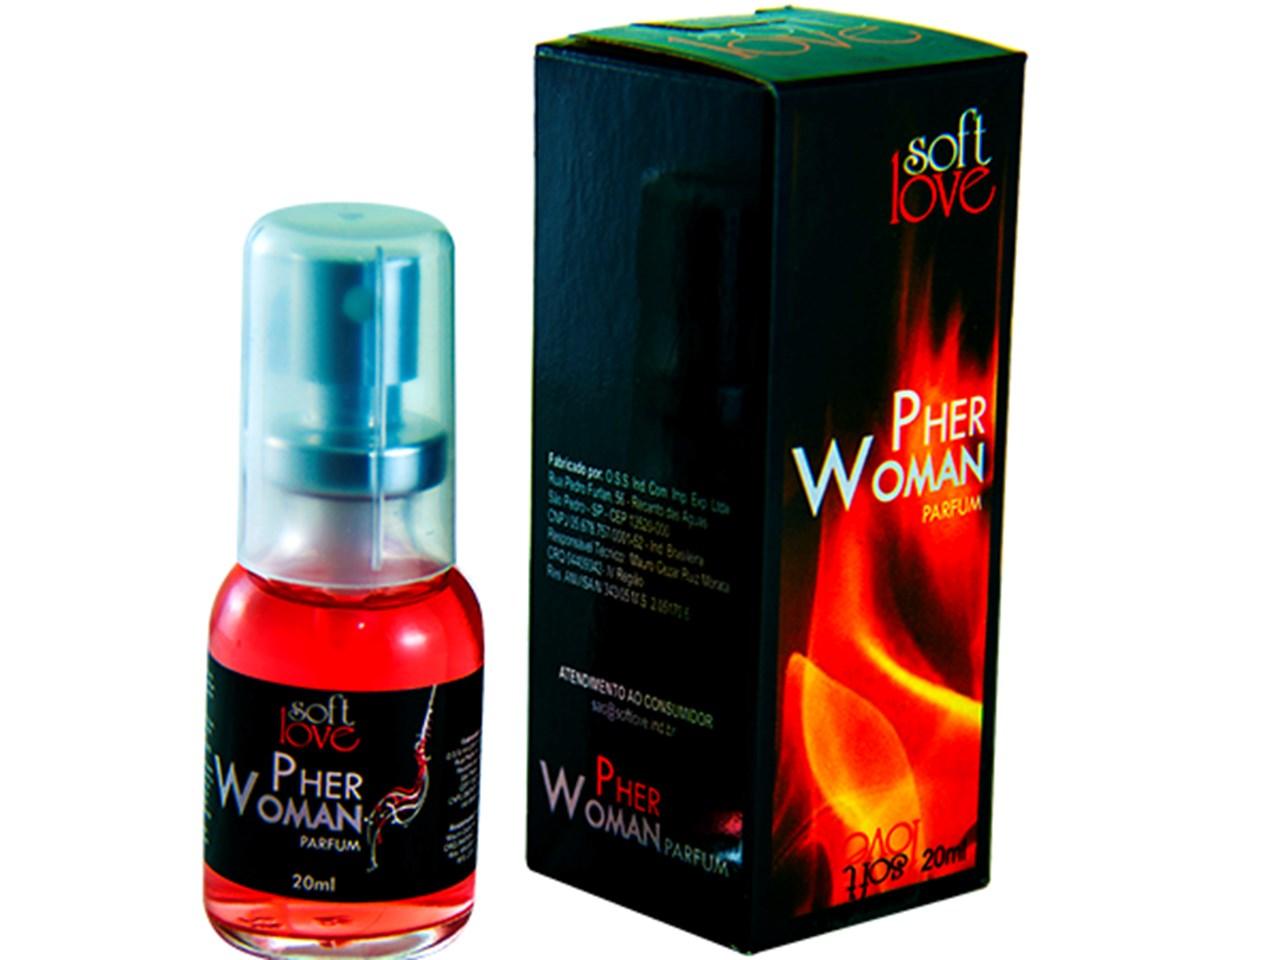 Perfume Afrodisíaco Pher Woman Feminino 20 ml  - Soft Love